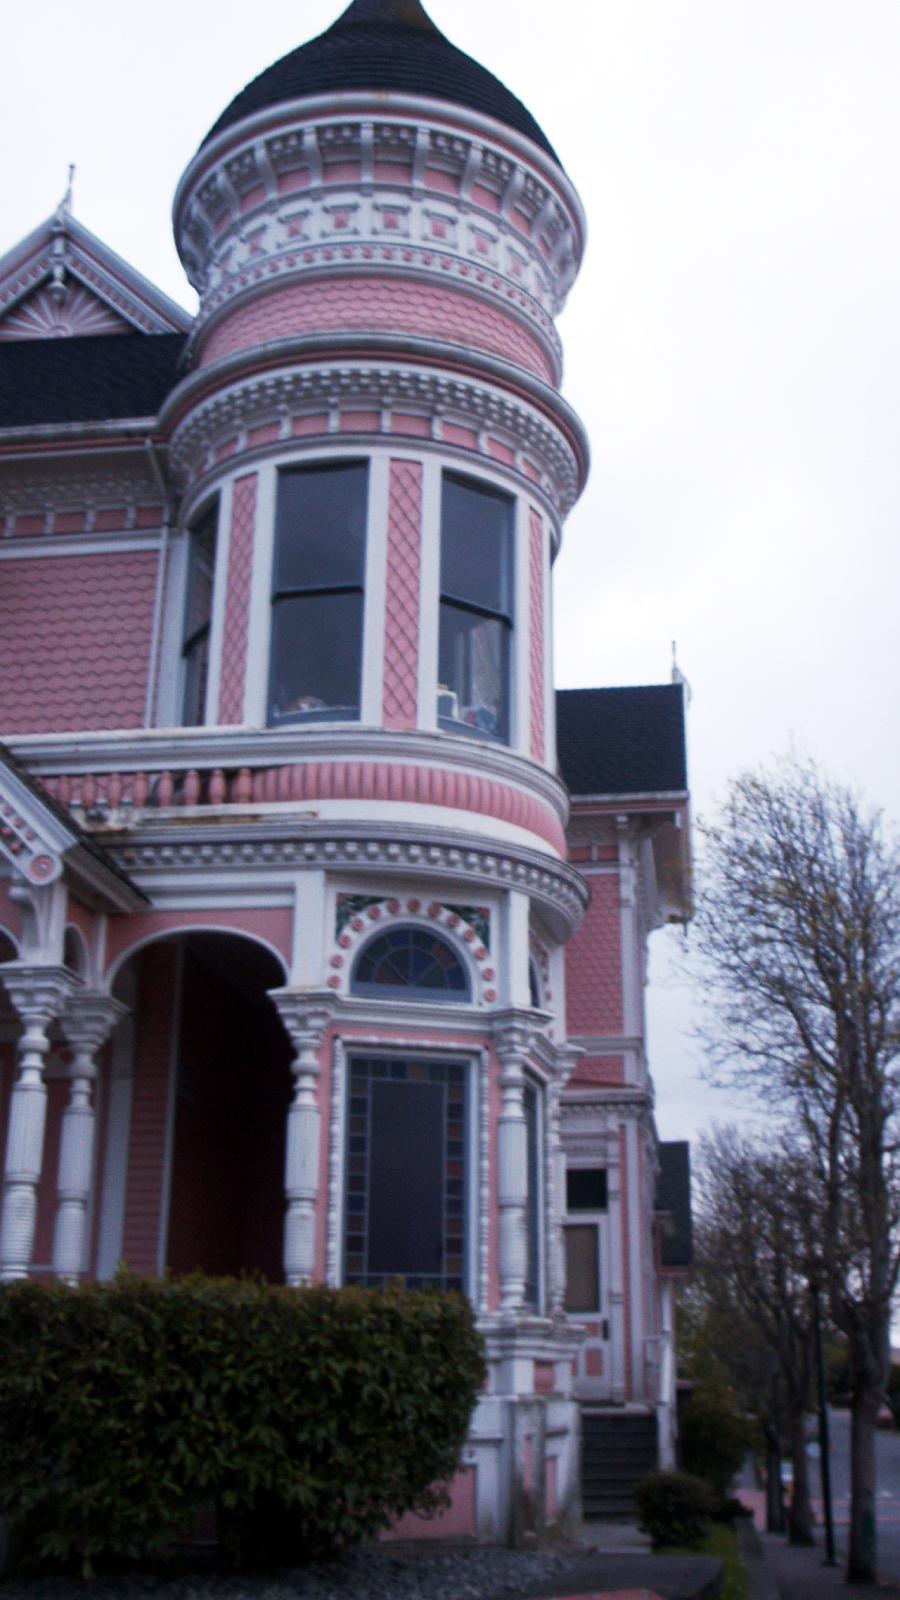 FileEureka CA Pink Lady Victorian Mansionjpg